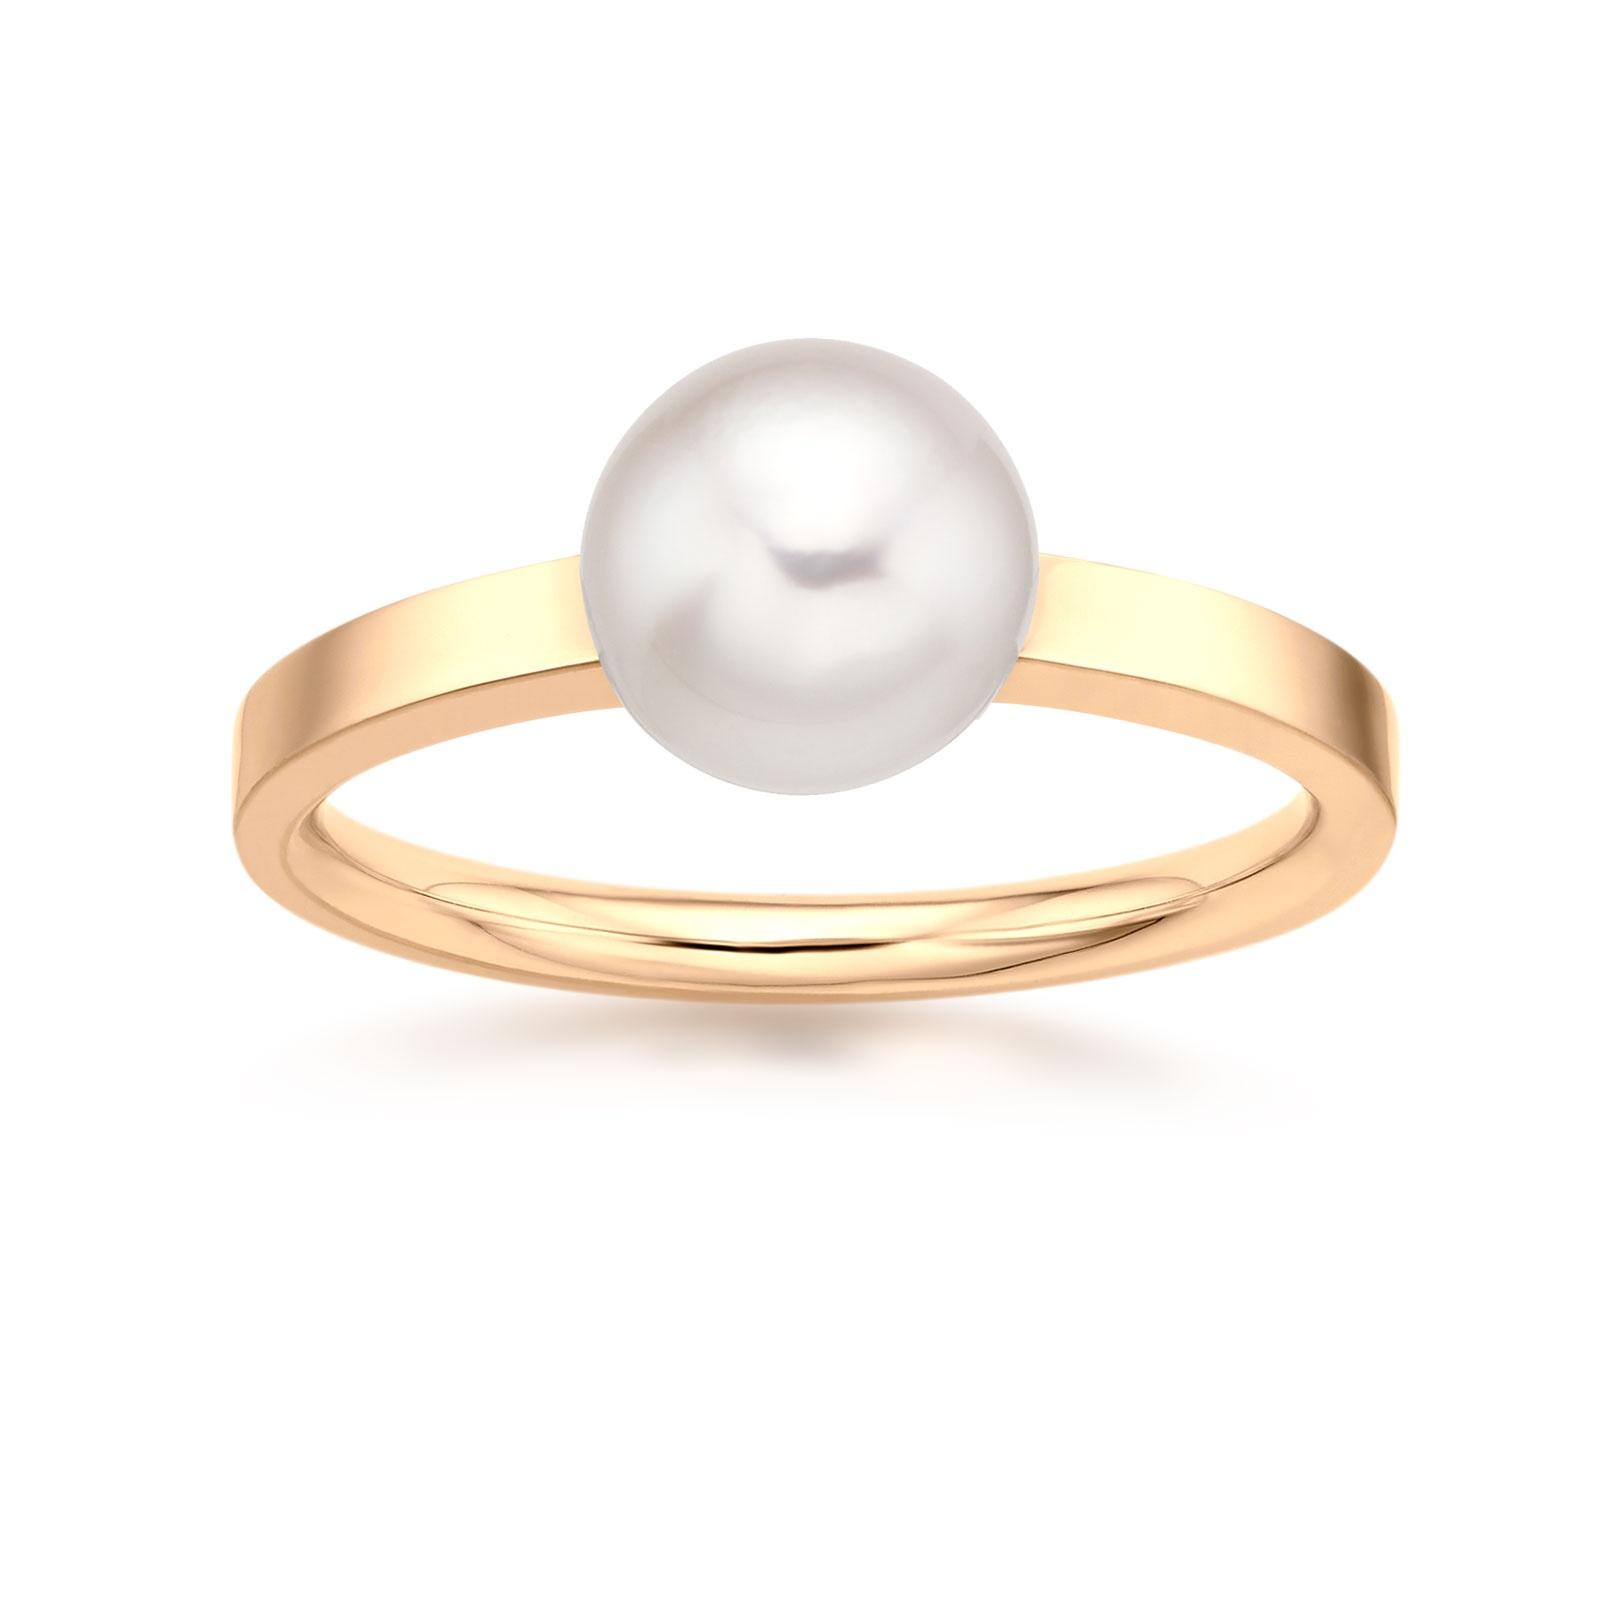 18 carat Yellow Gold Akoya Pearl Ring